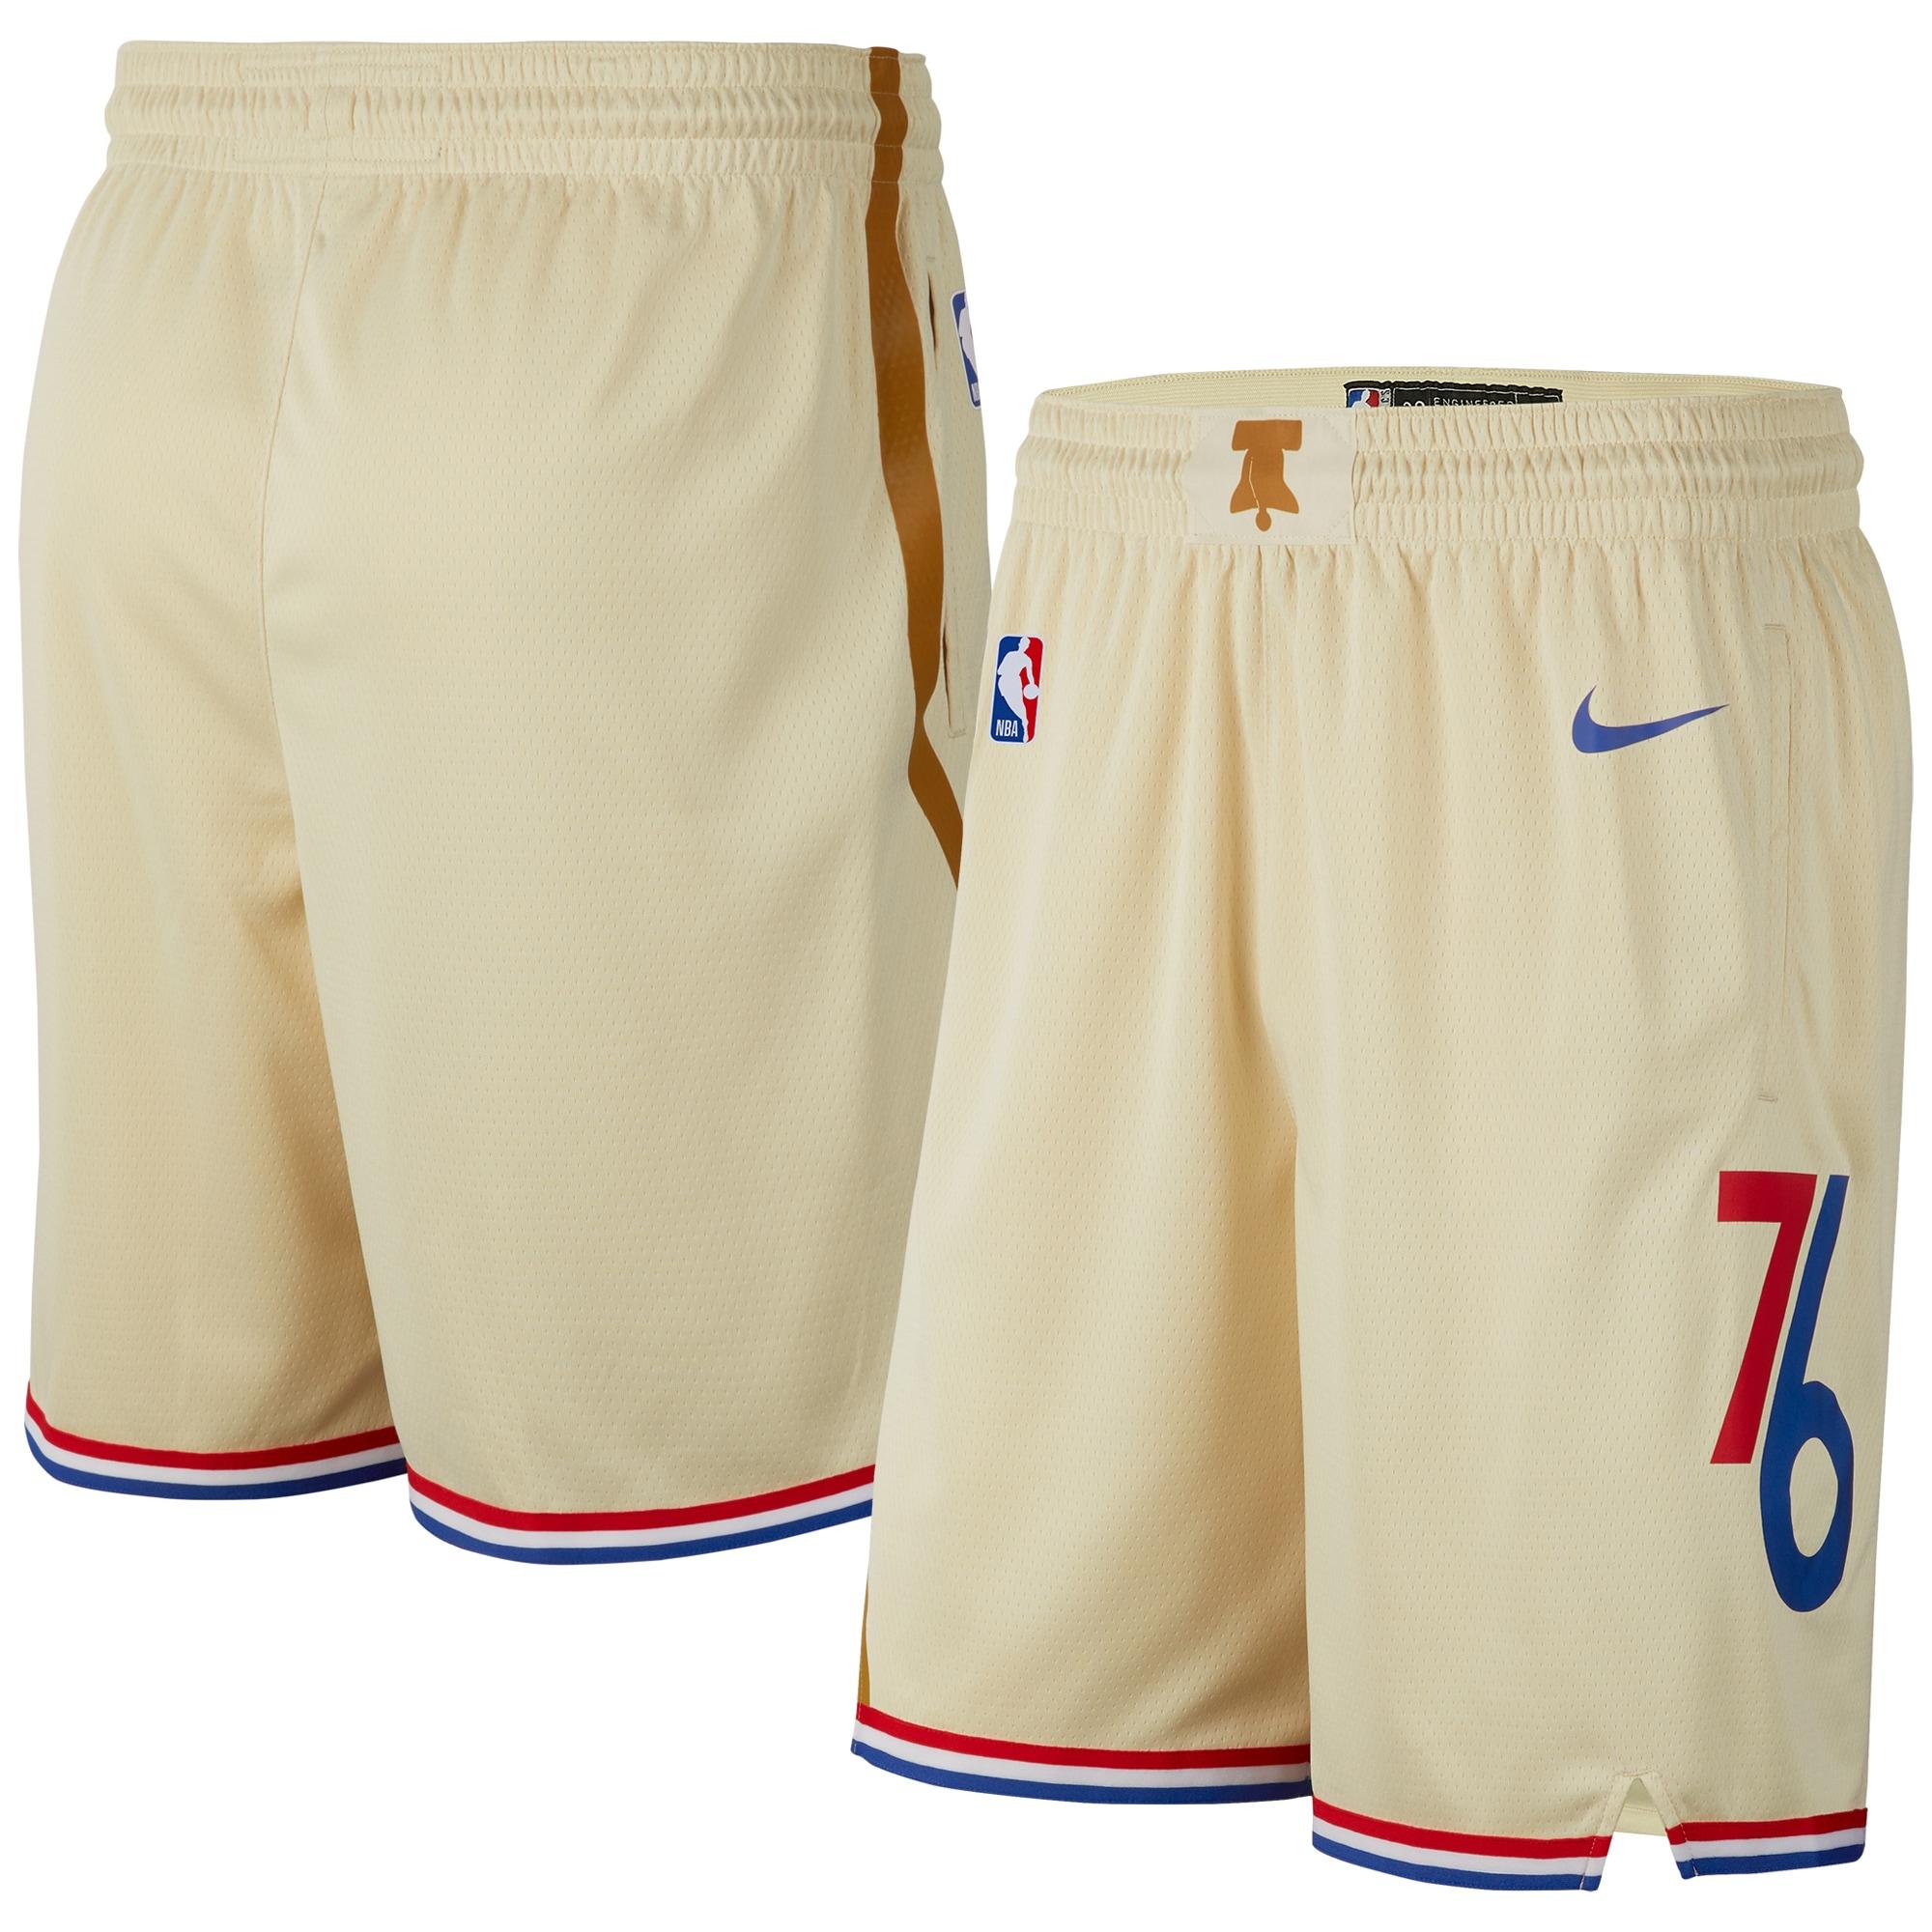 Philadelphia 76ers Nike Youth 2019/20 City Edition Swingman Shorts - Cream